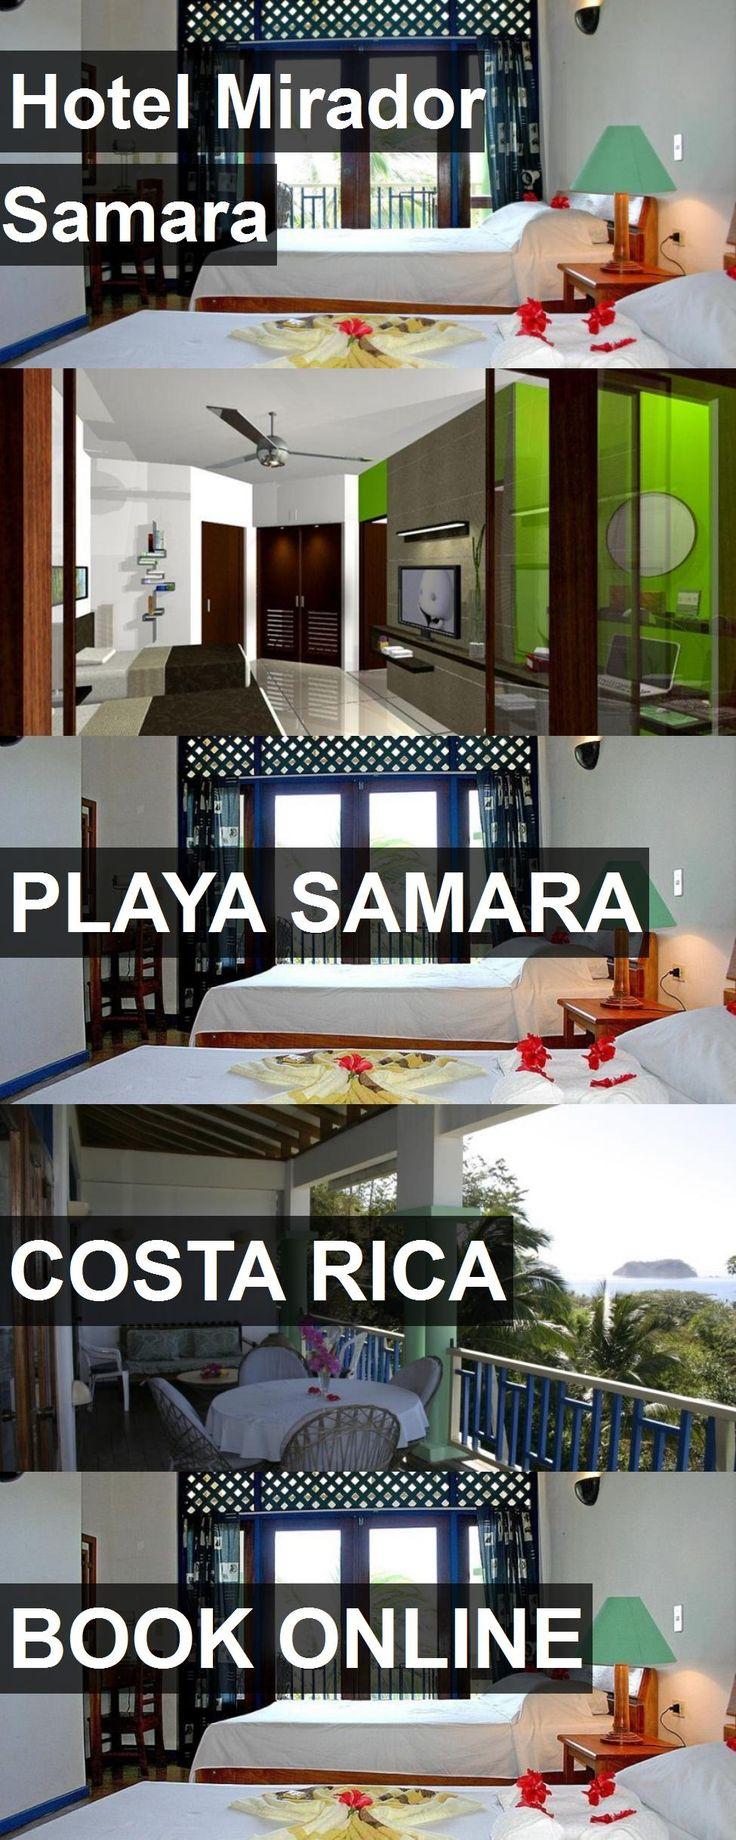 Hotel Mirador Samara in Playa Samara, Costa Rica. For more information, photos, reviews and best prices please follow the link. #CostaRica #PlayaSamara #travel #vacation #hotel